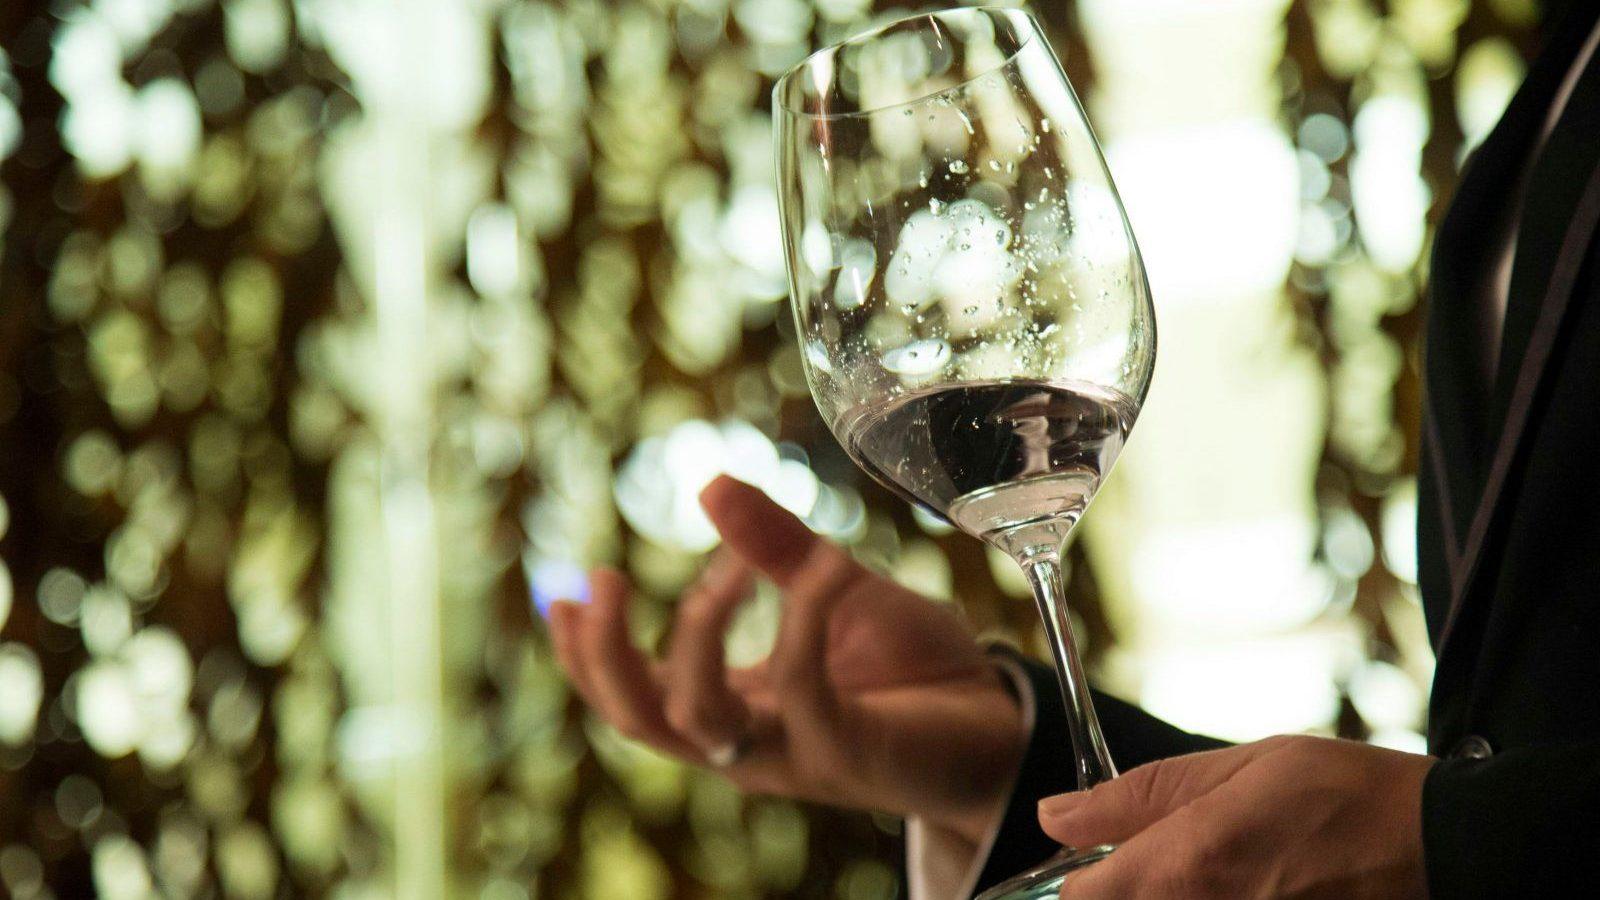 A glass half full or half empty?